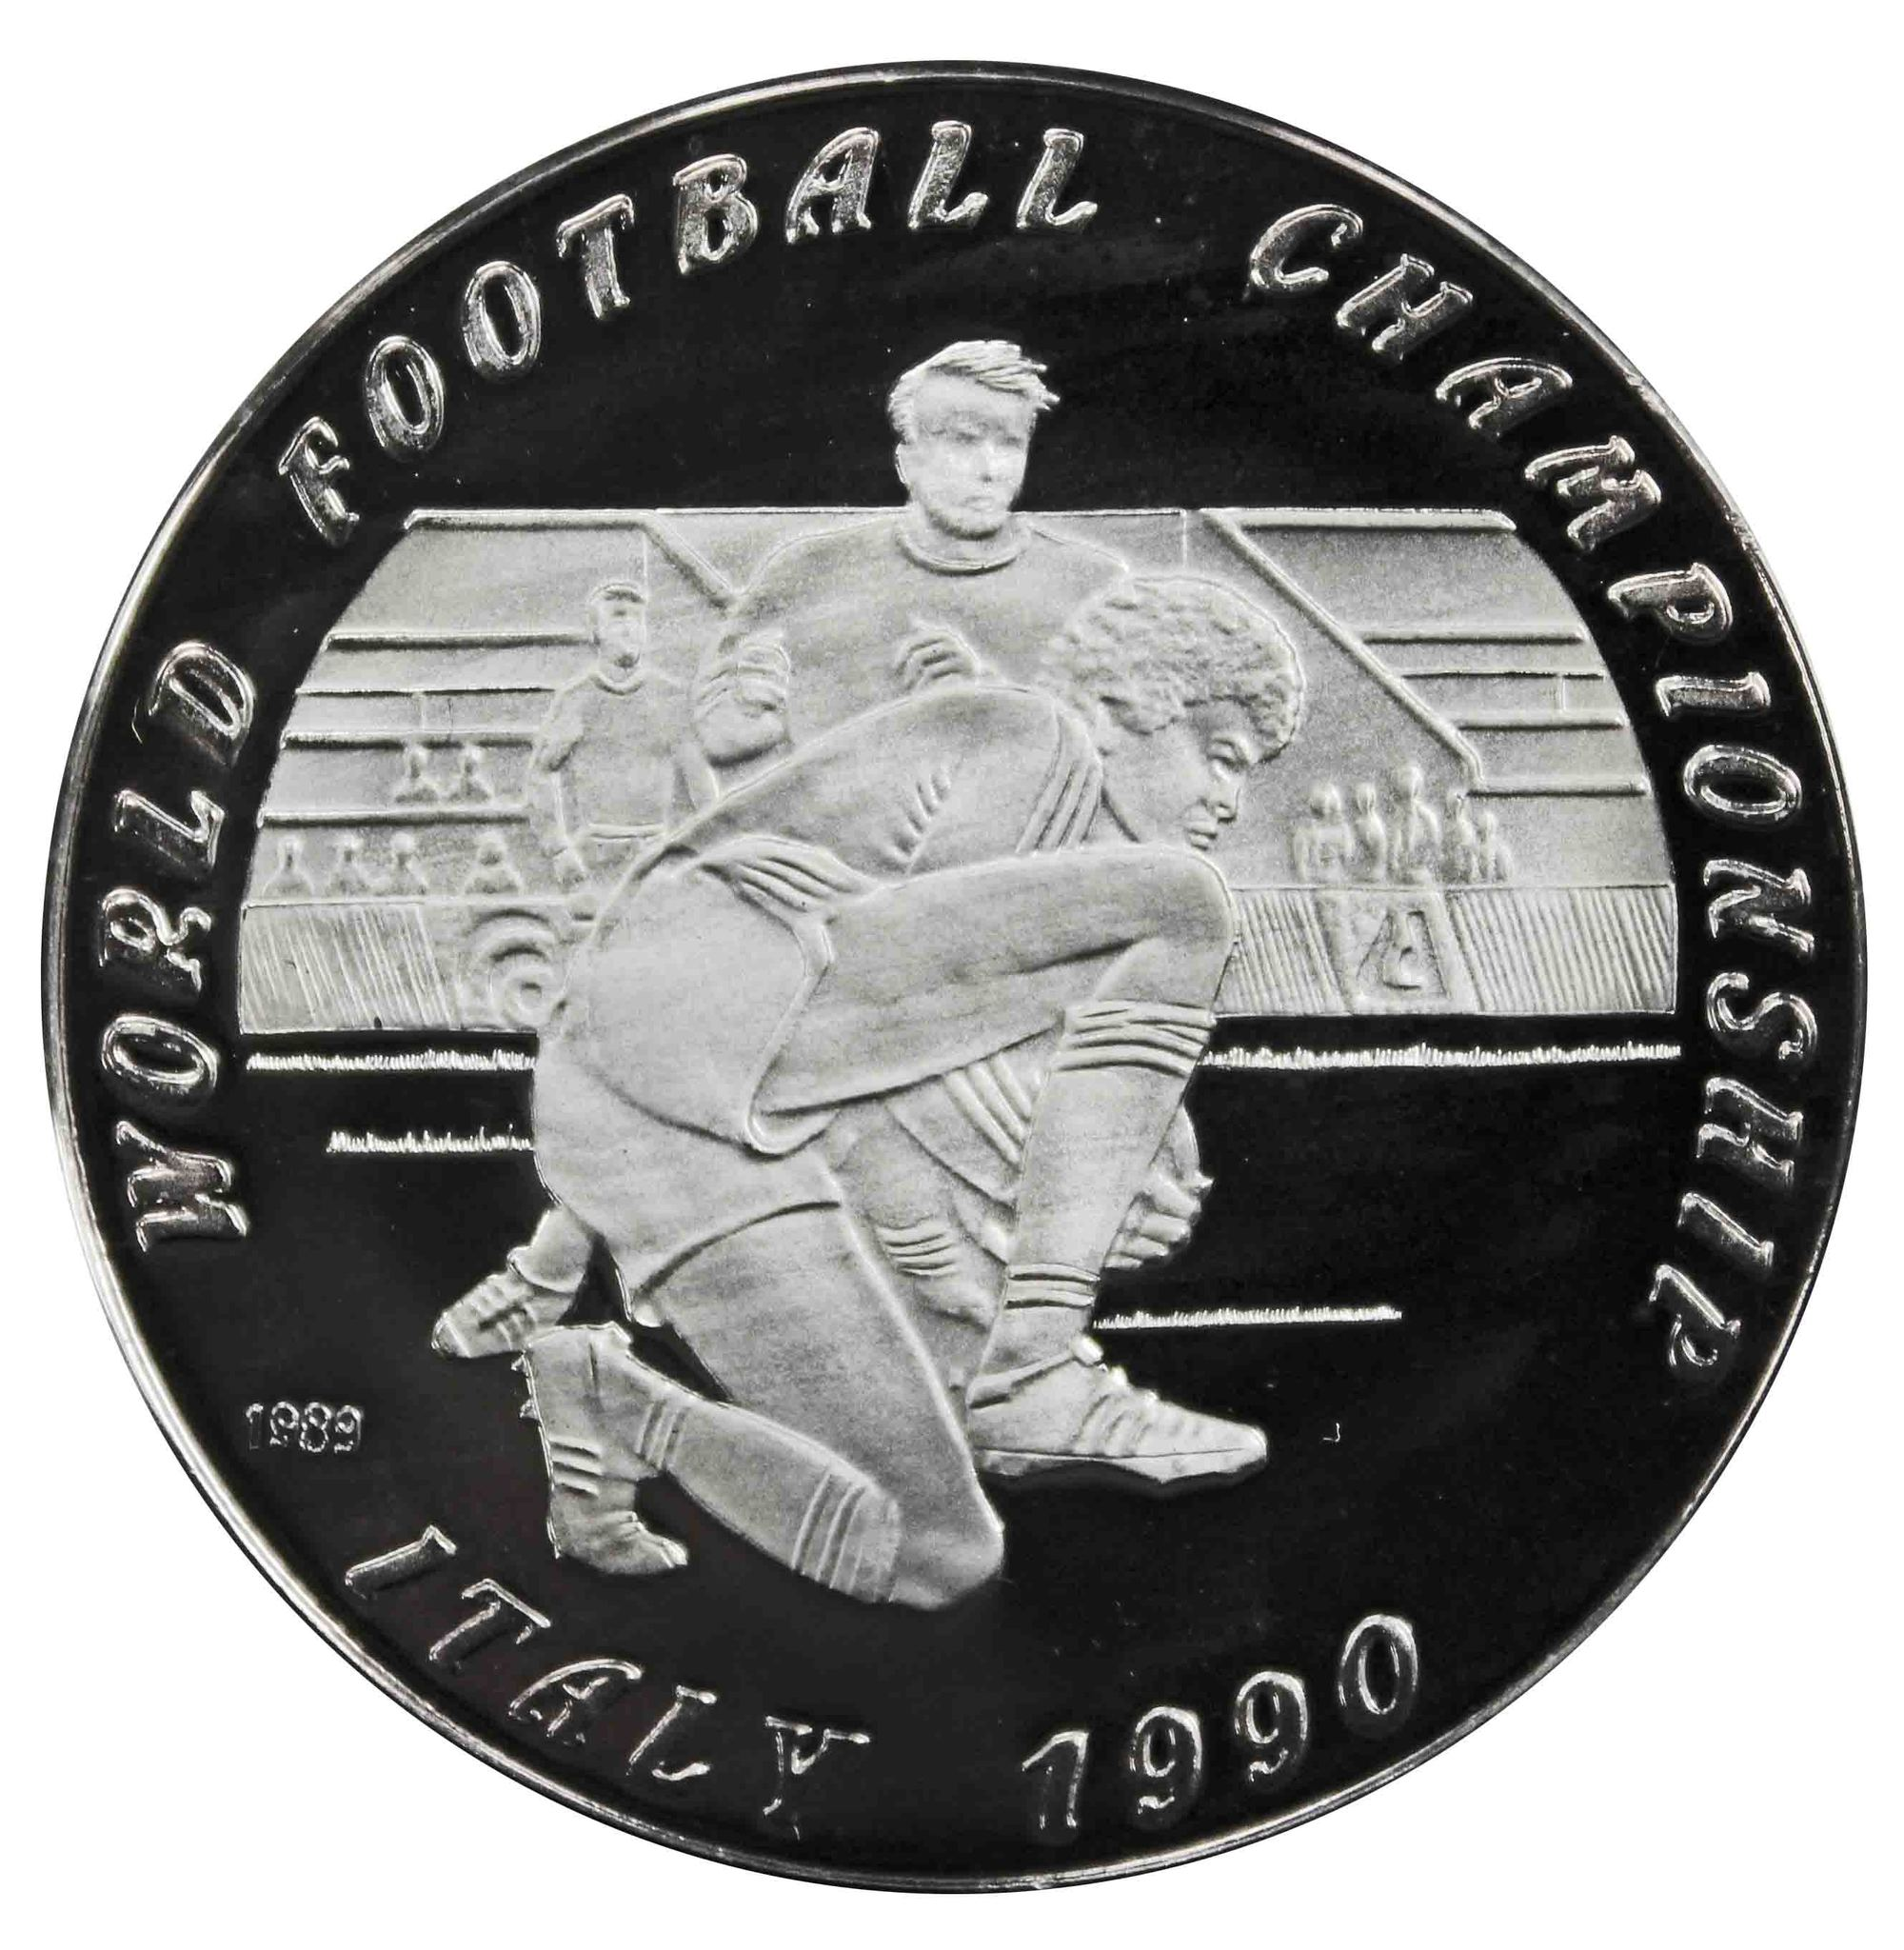 50 кип Чемпионат мира по футболу 1990 года. Лаос. 1989 год. PROOF